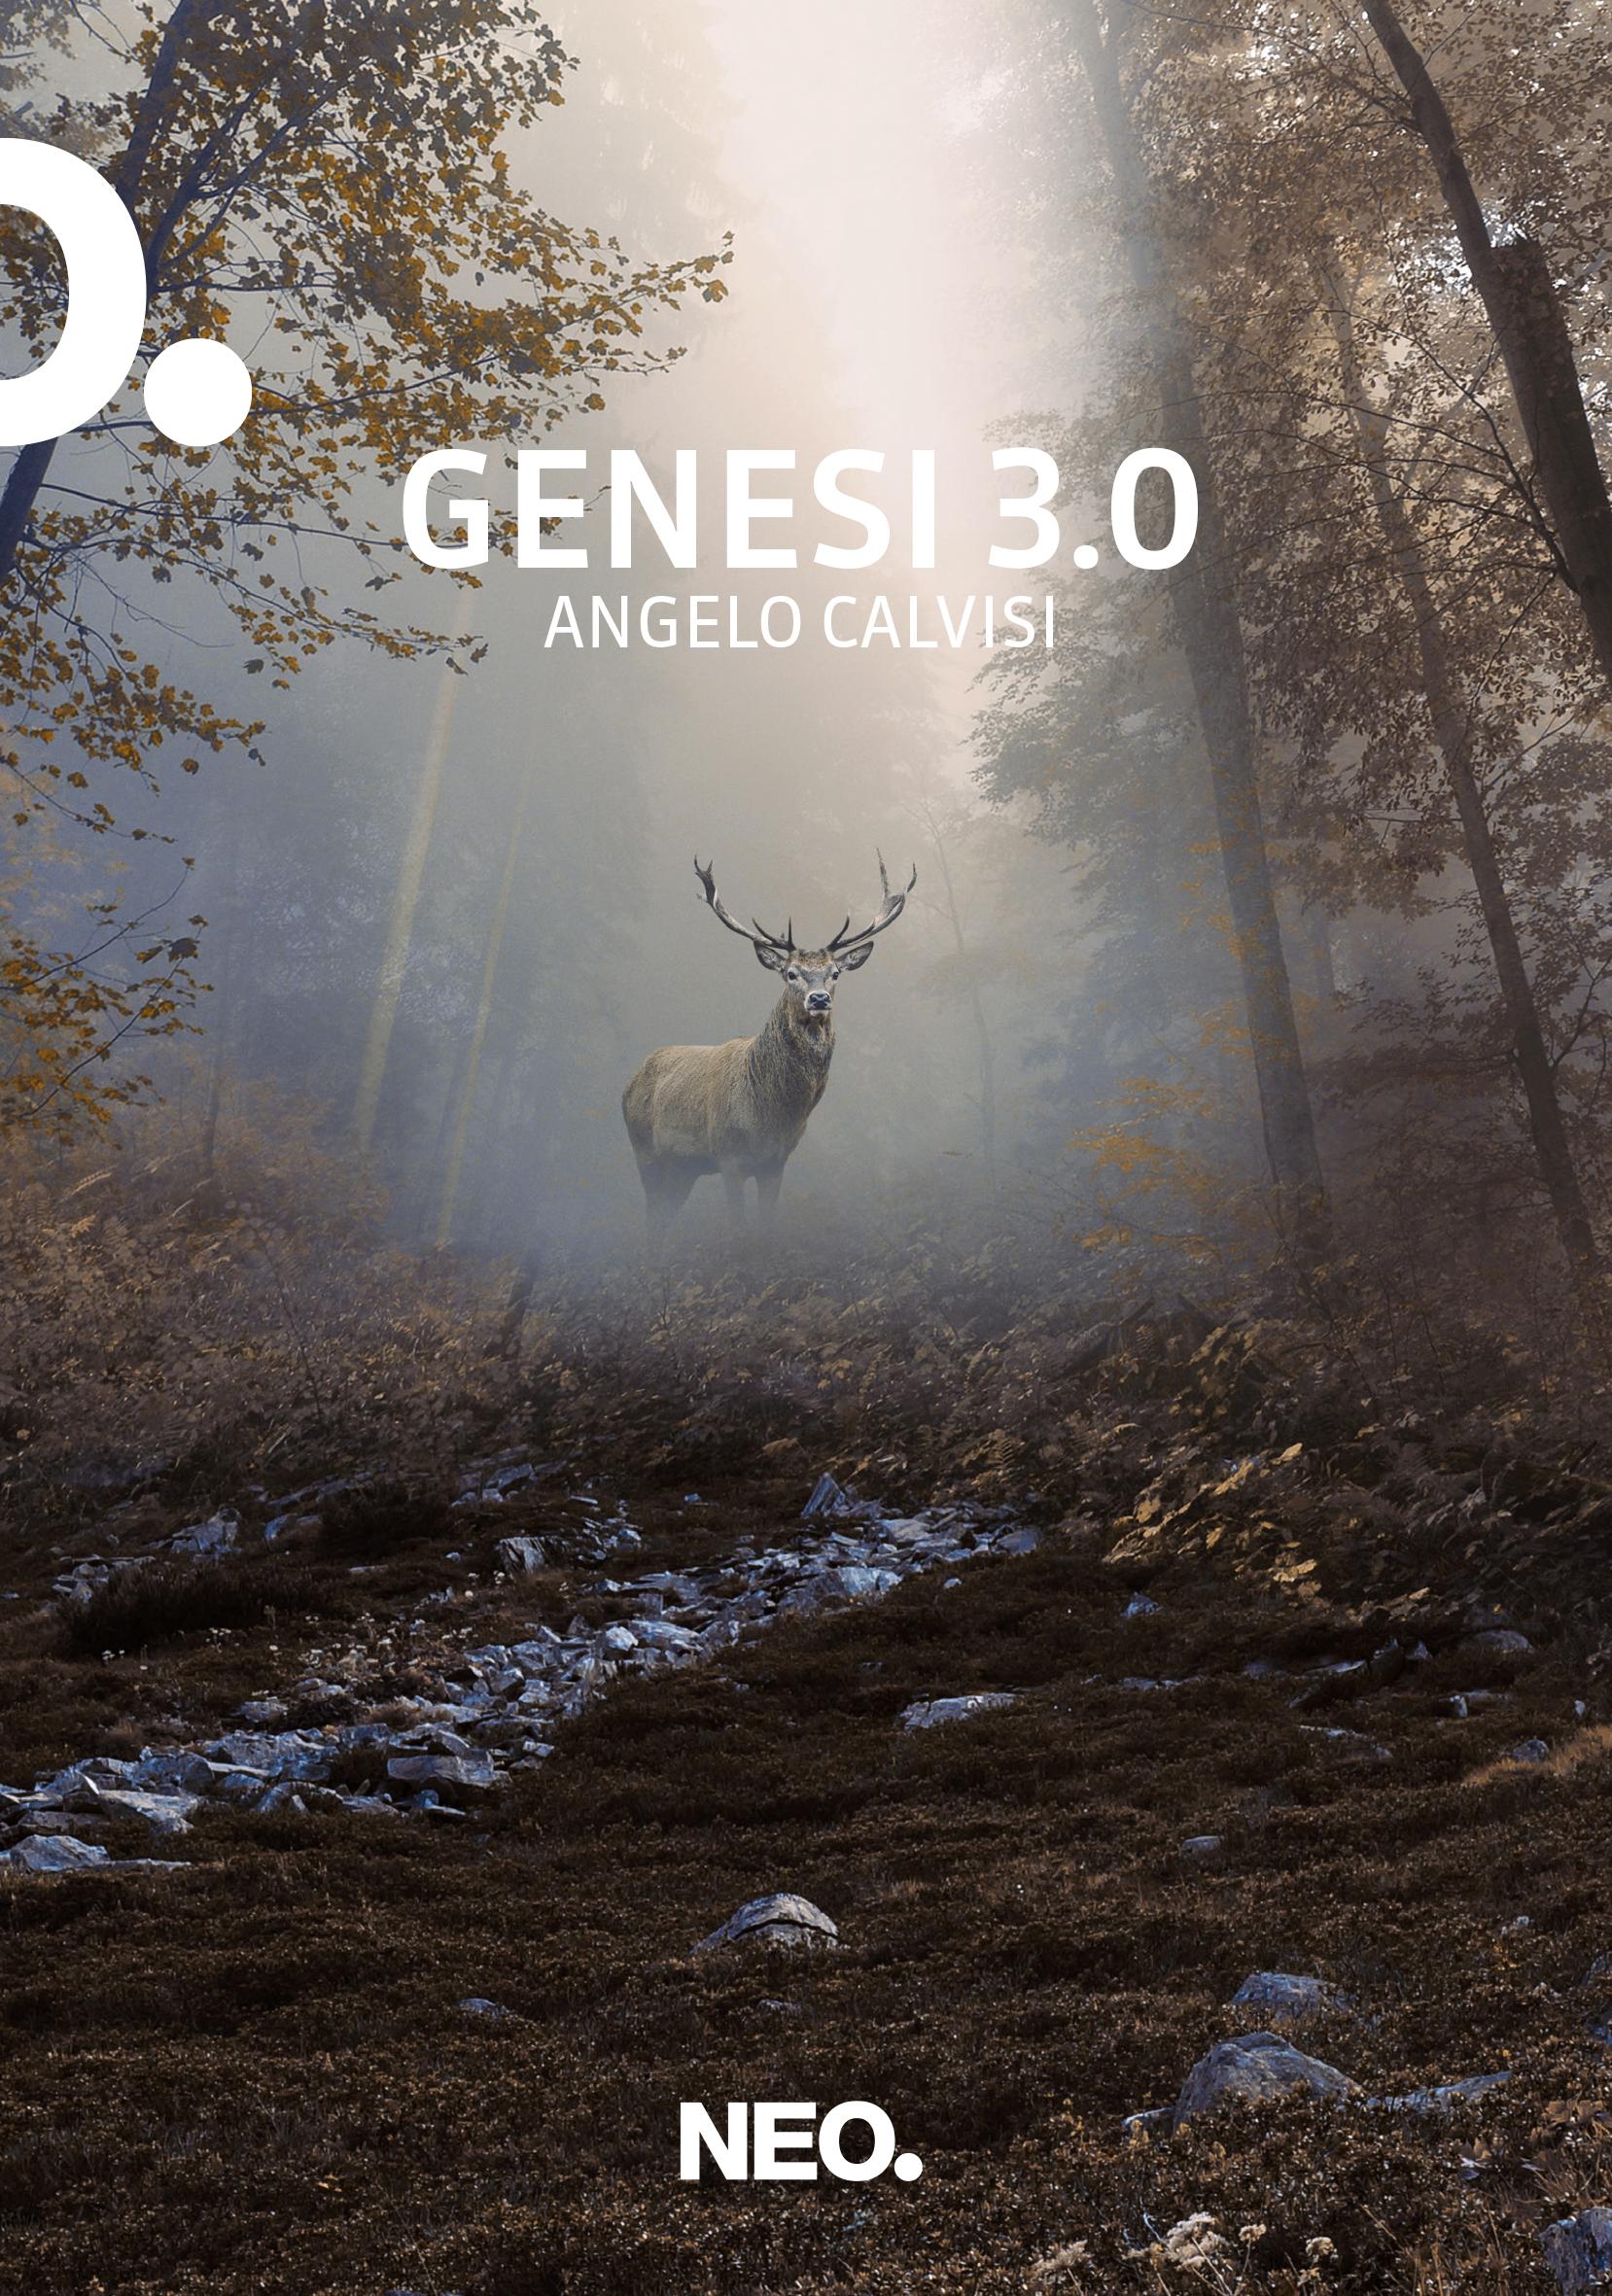 copertina_Calvisi_GENESI3.0.indd